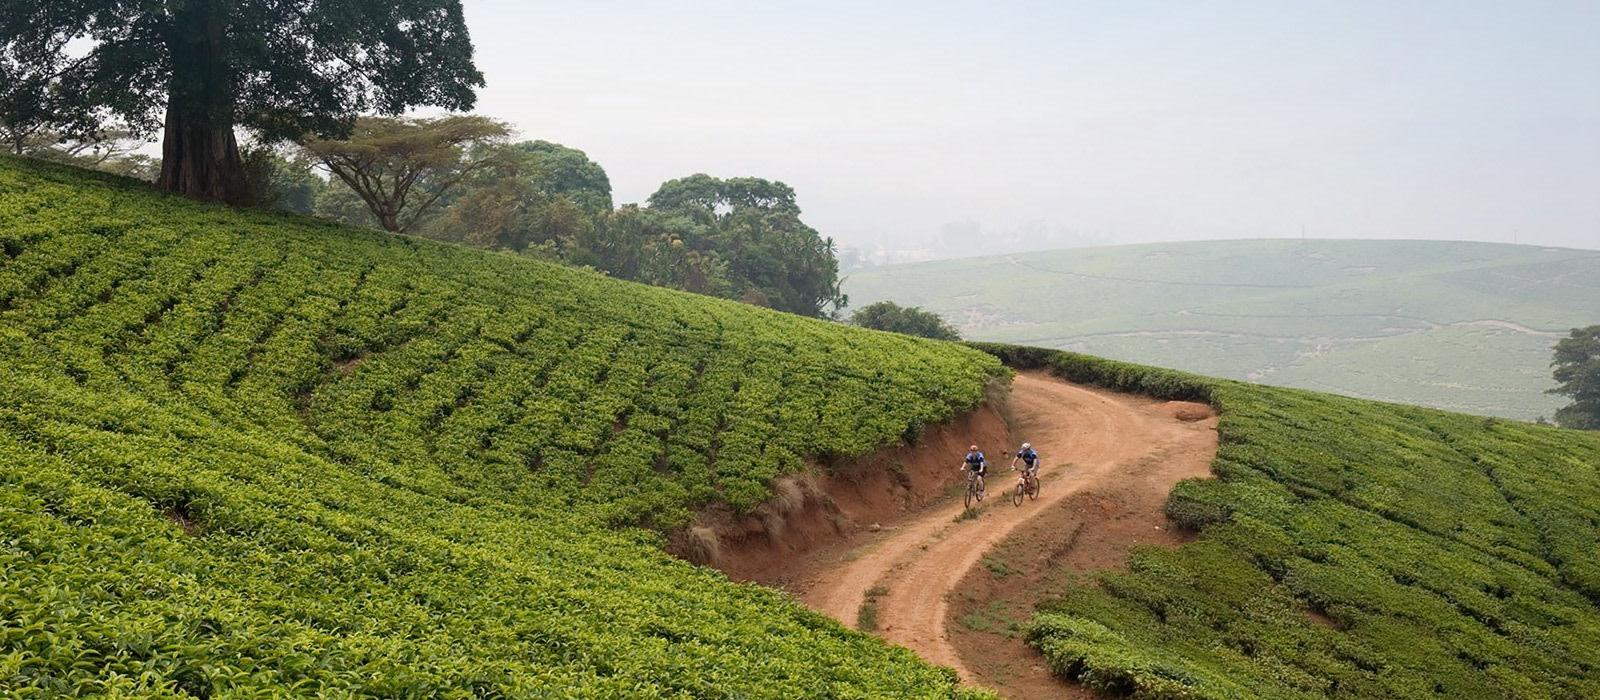 Malawi Rundreise: Natur, Safari und Lake Malawi Urlaub 1